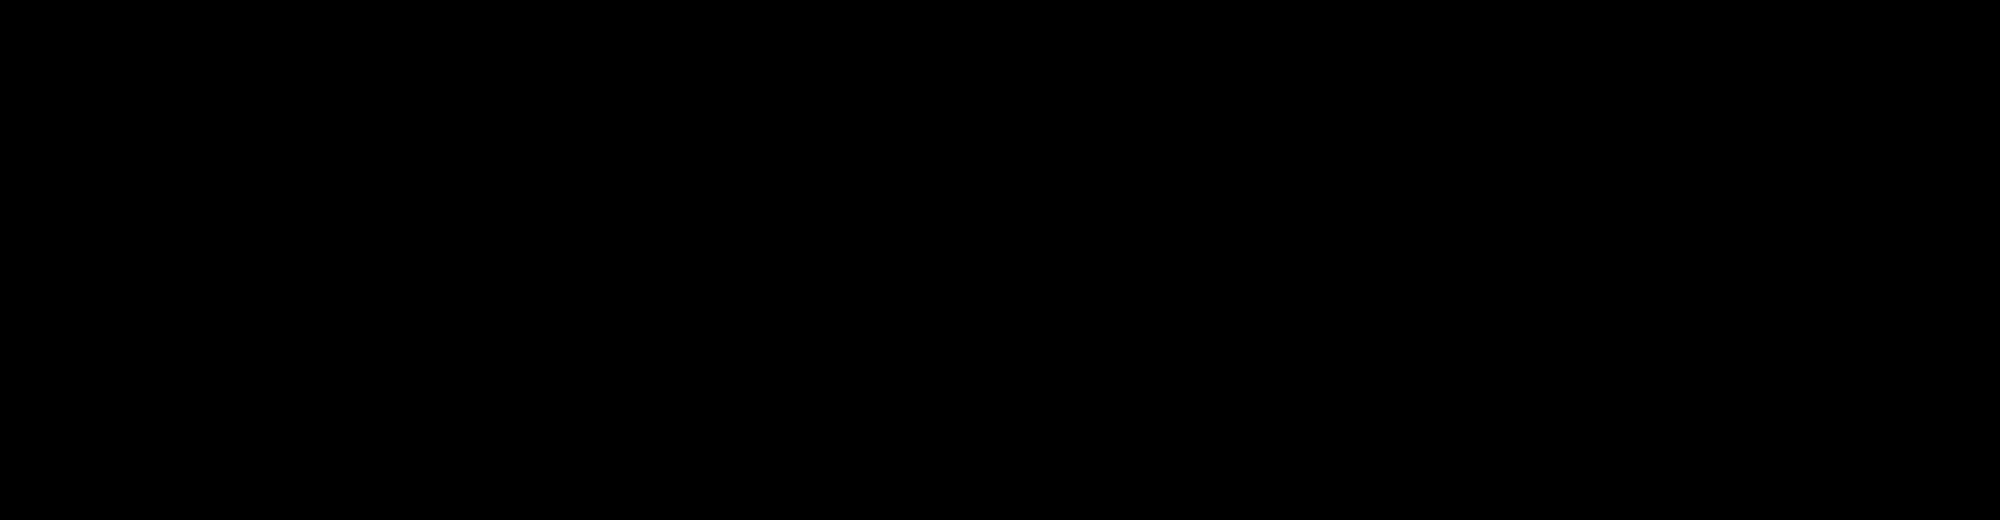 Tokuma Shoten logo.png